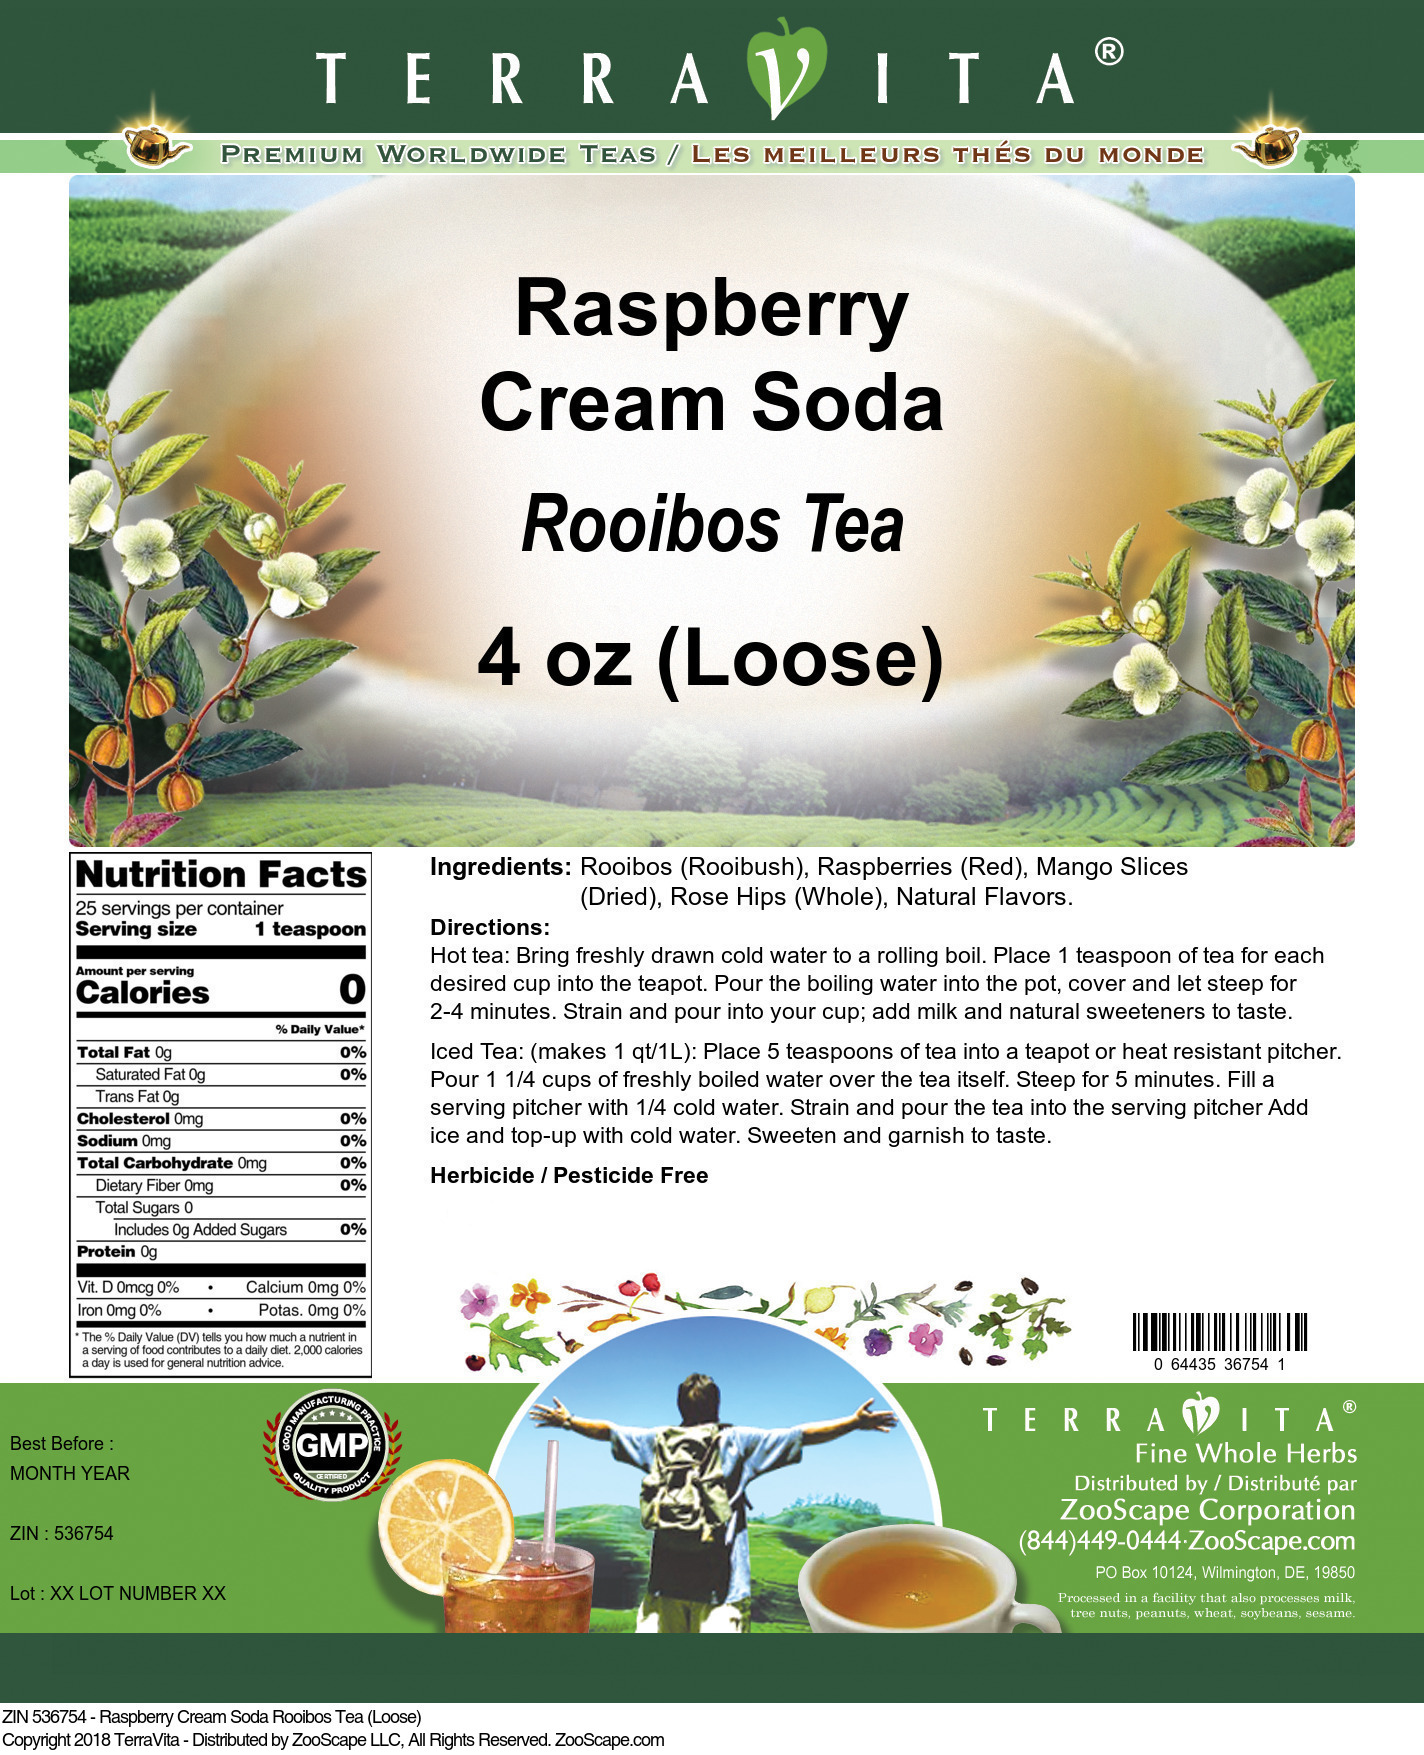 Raspberry Cream Soda Rooibos Tea